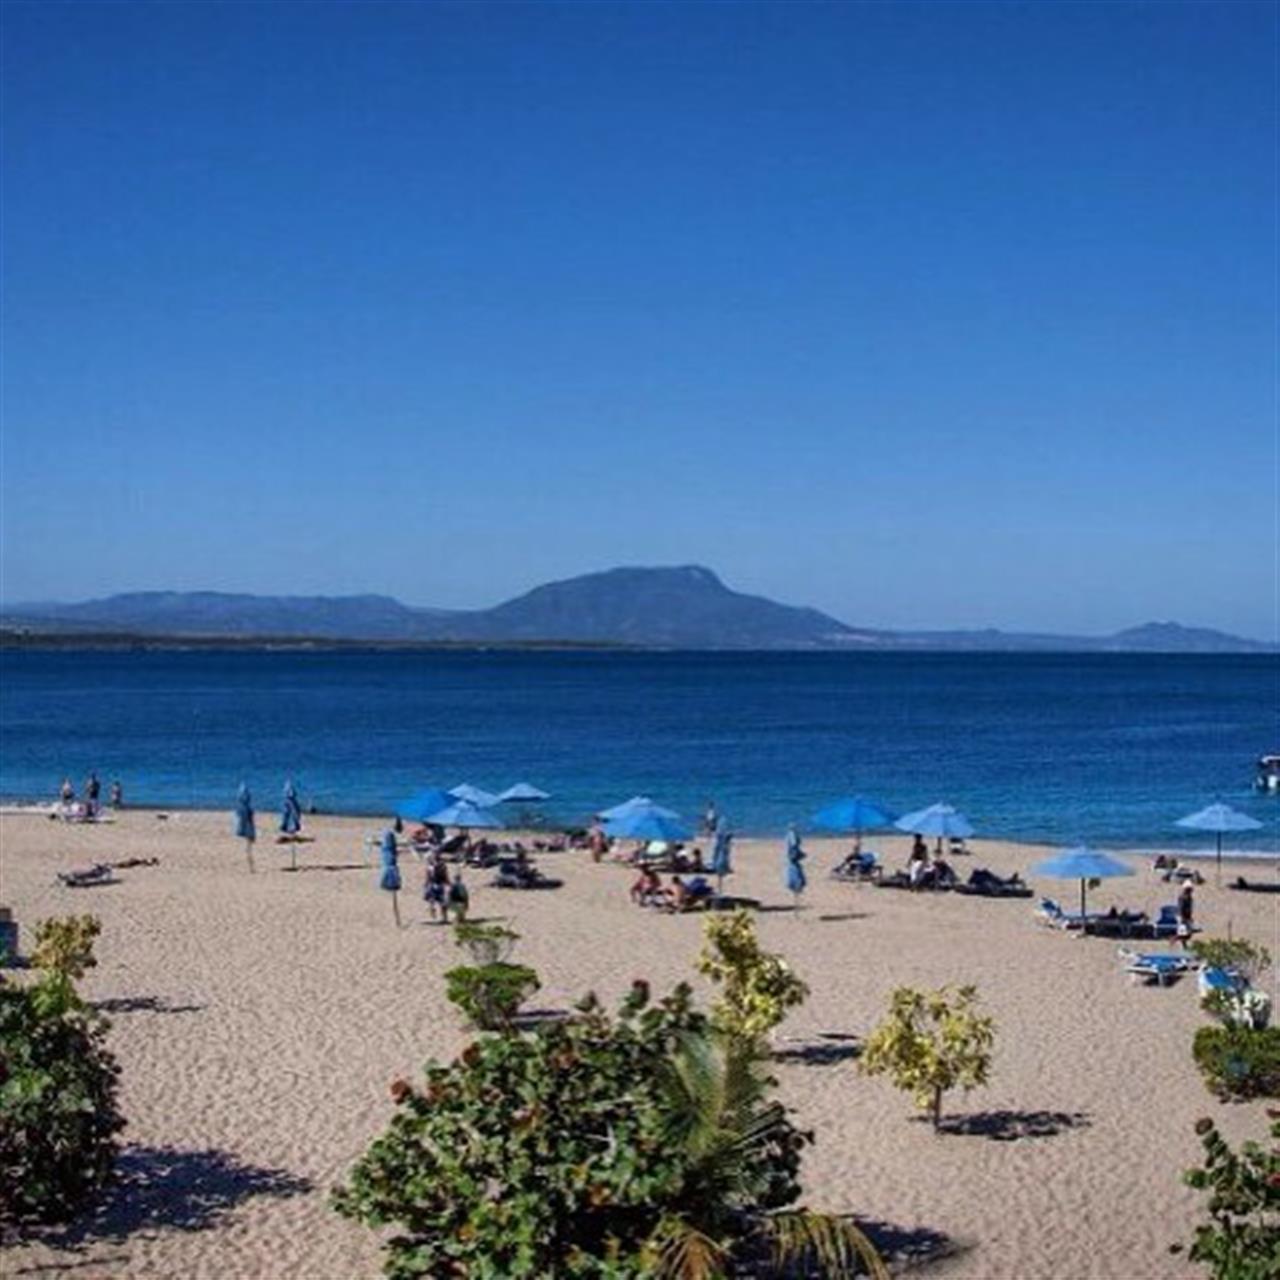 Sosua, Playa Alicia, Dominican Republic. Beachfront Condos #beachfront #condos #sosua #beach #sun #DominicanRepublic #leadingrelocal  www.selectcaribbean.com